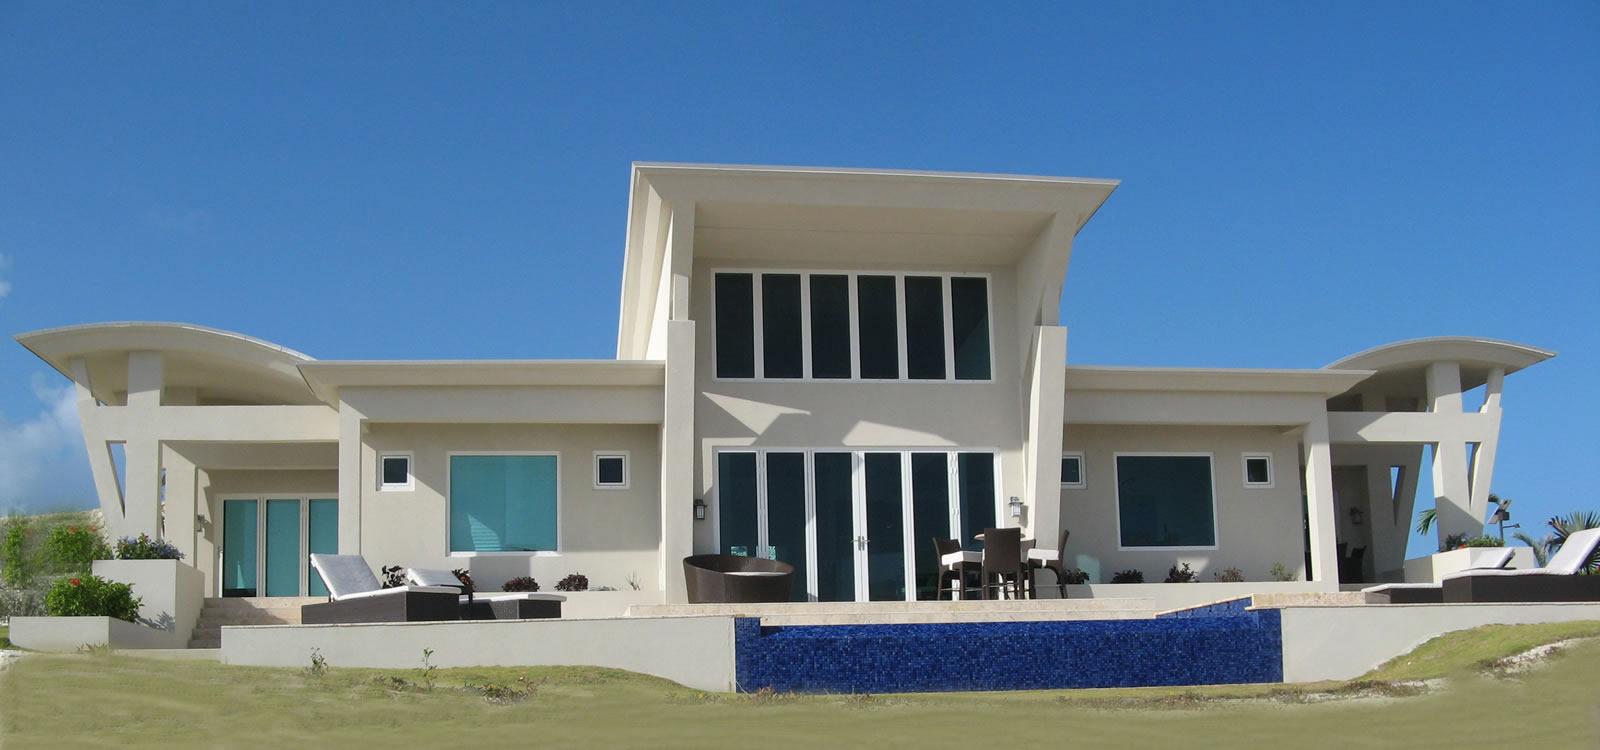 4 Bedroom Beachfront Home for Sale, Eleuthera, The Bahamas  7th Heaven Properties